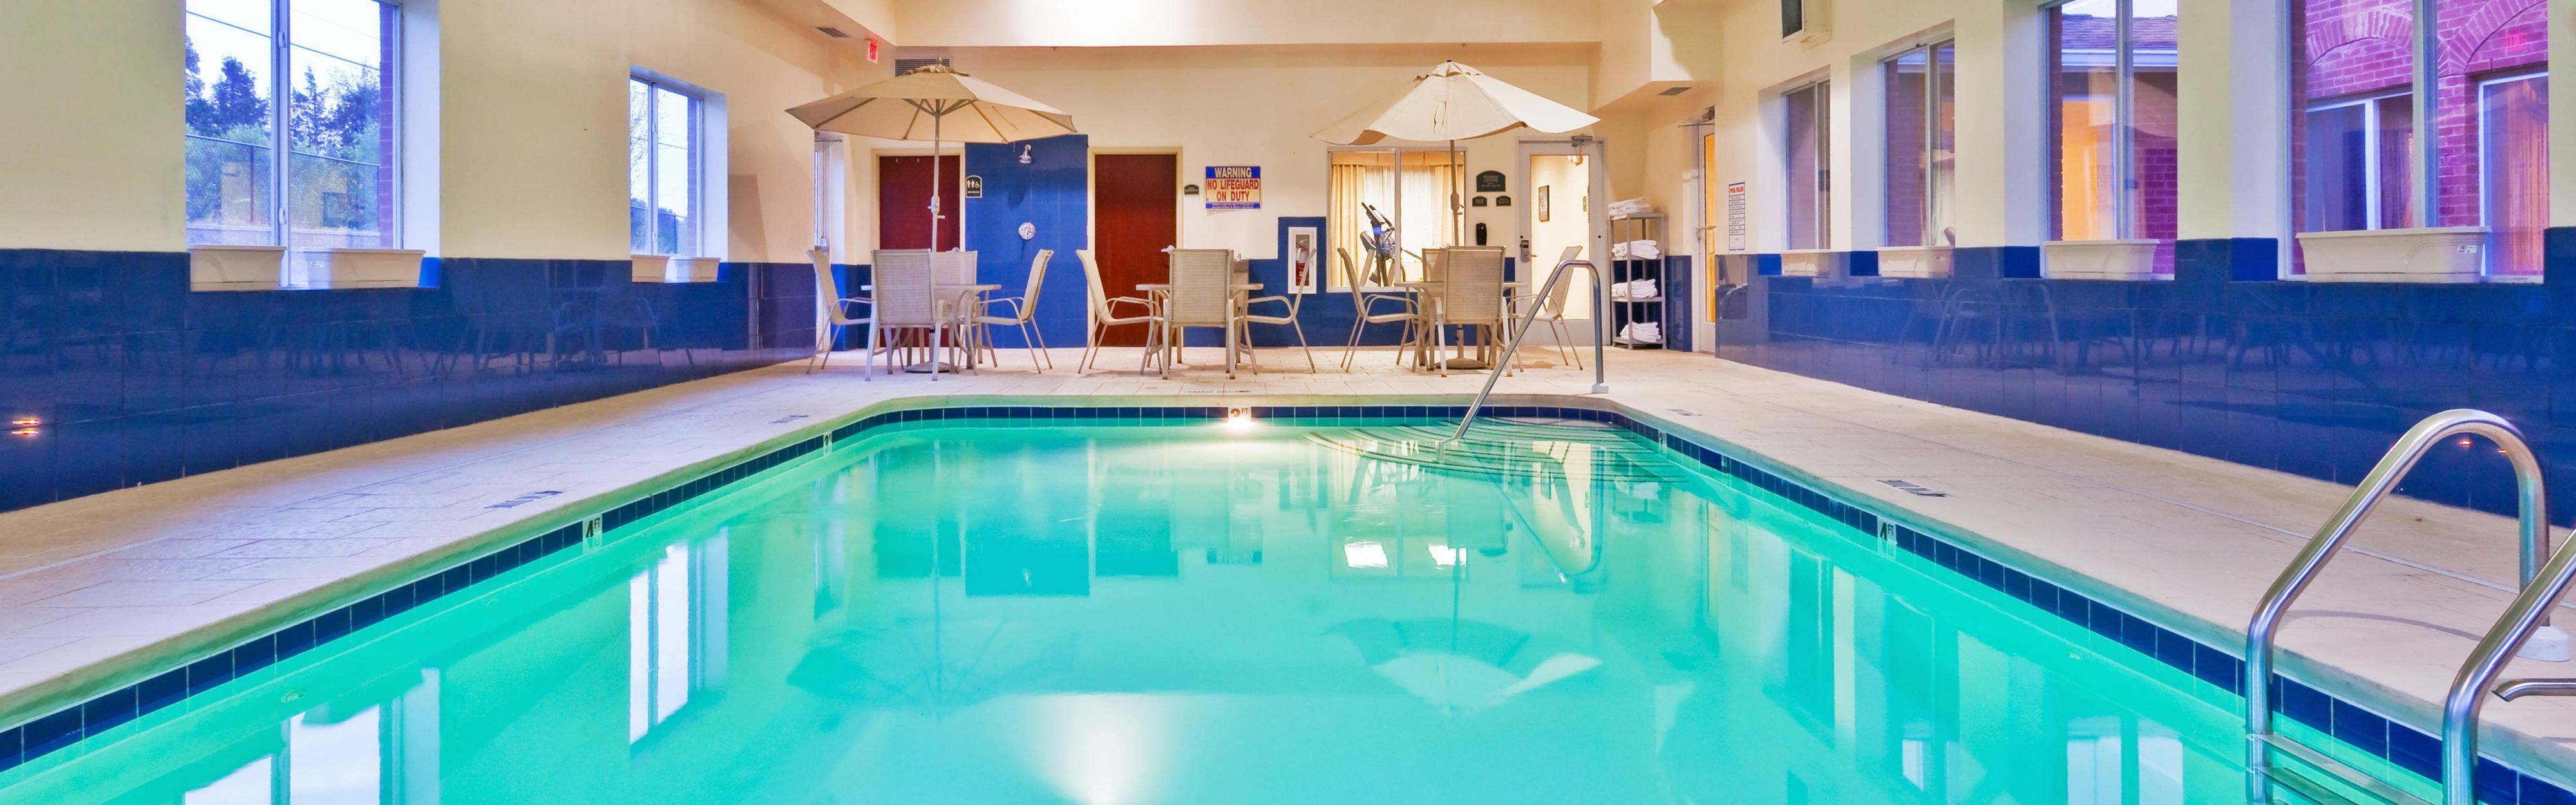 Holiday Inn Express Dickson image 2